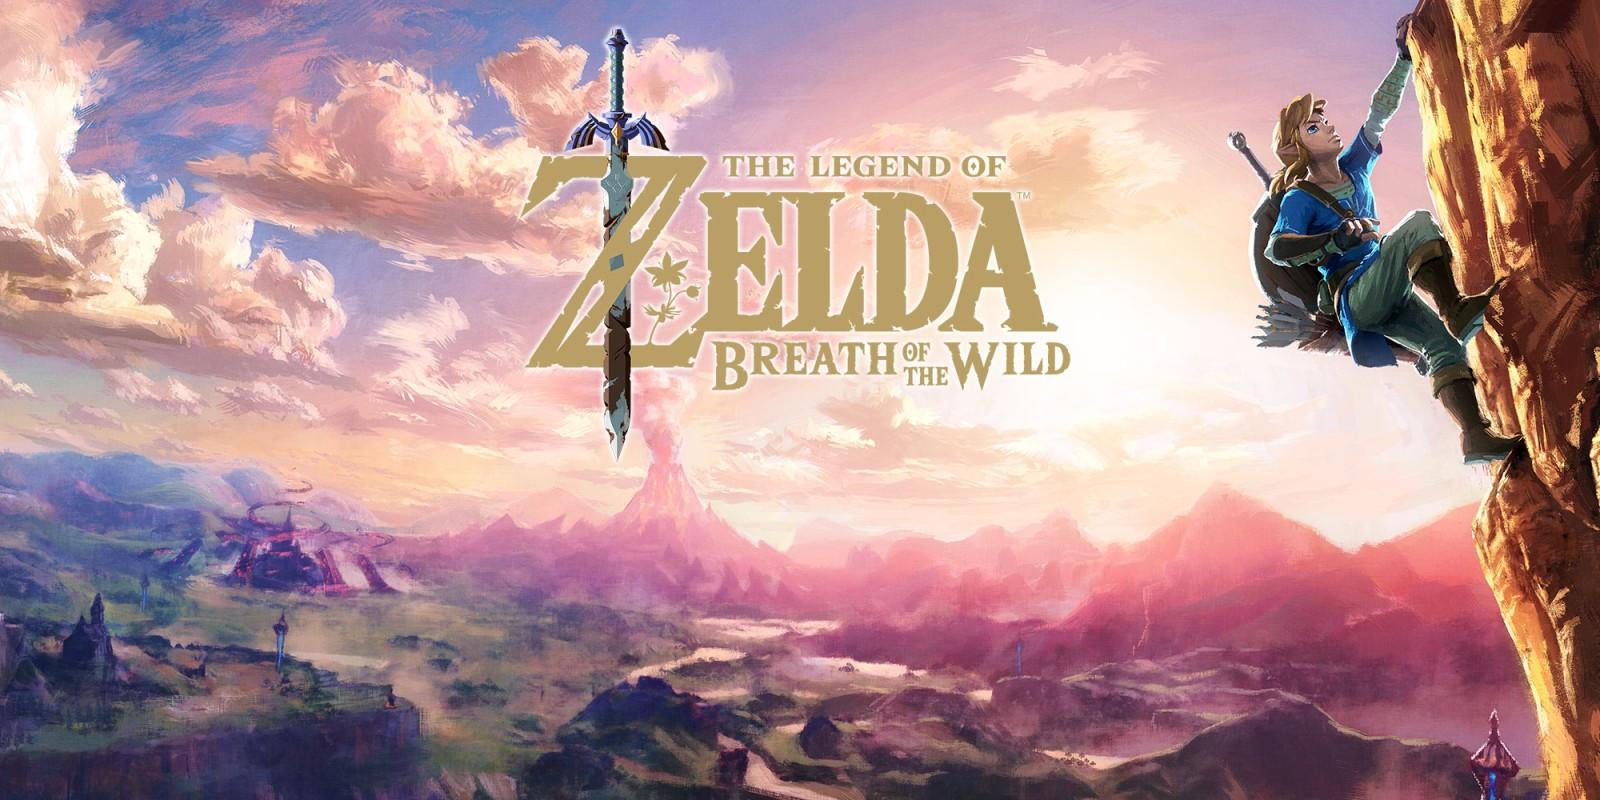 The Legend of Zelda: Breath of the Wild jdrpg.fr